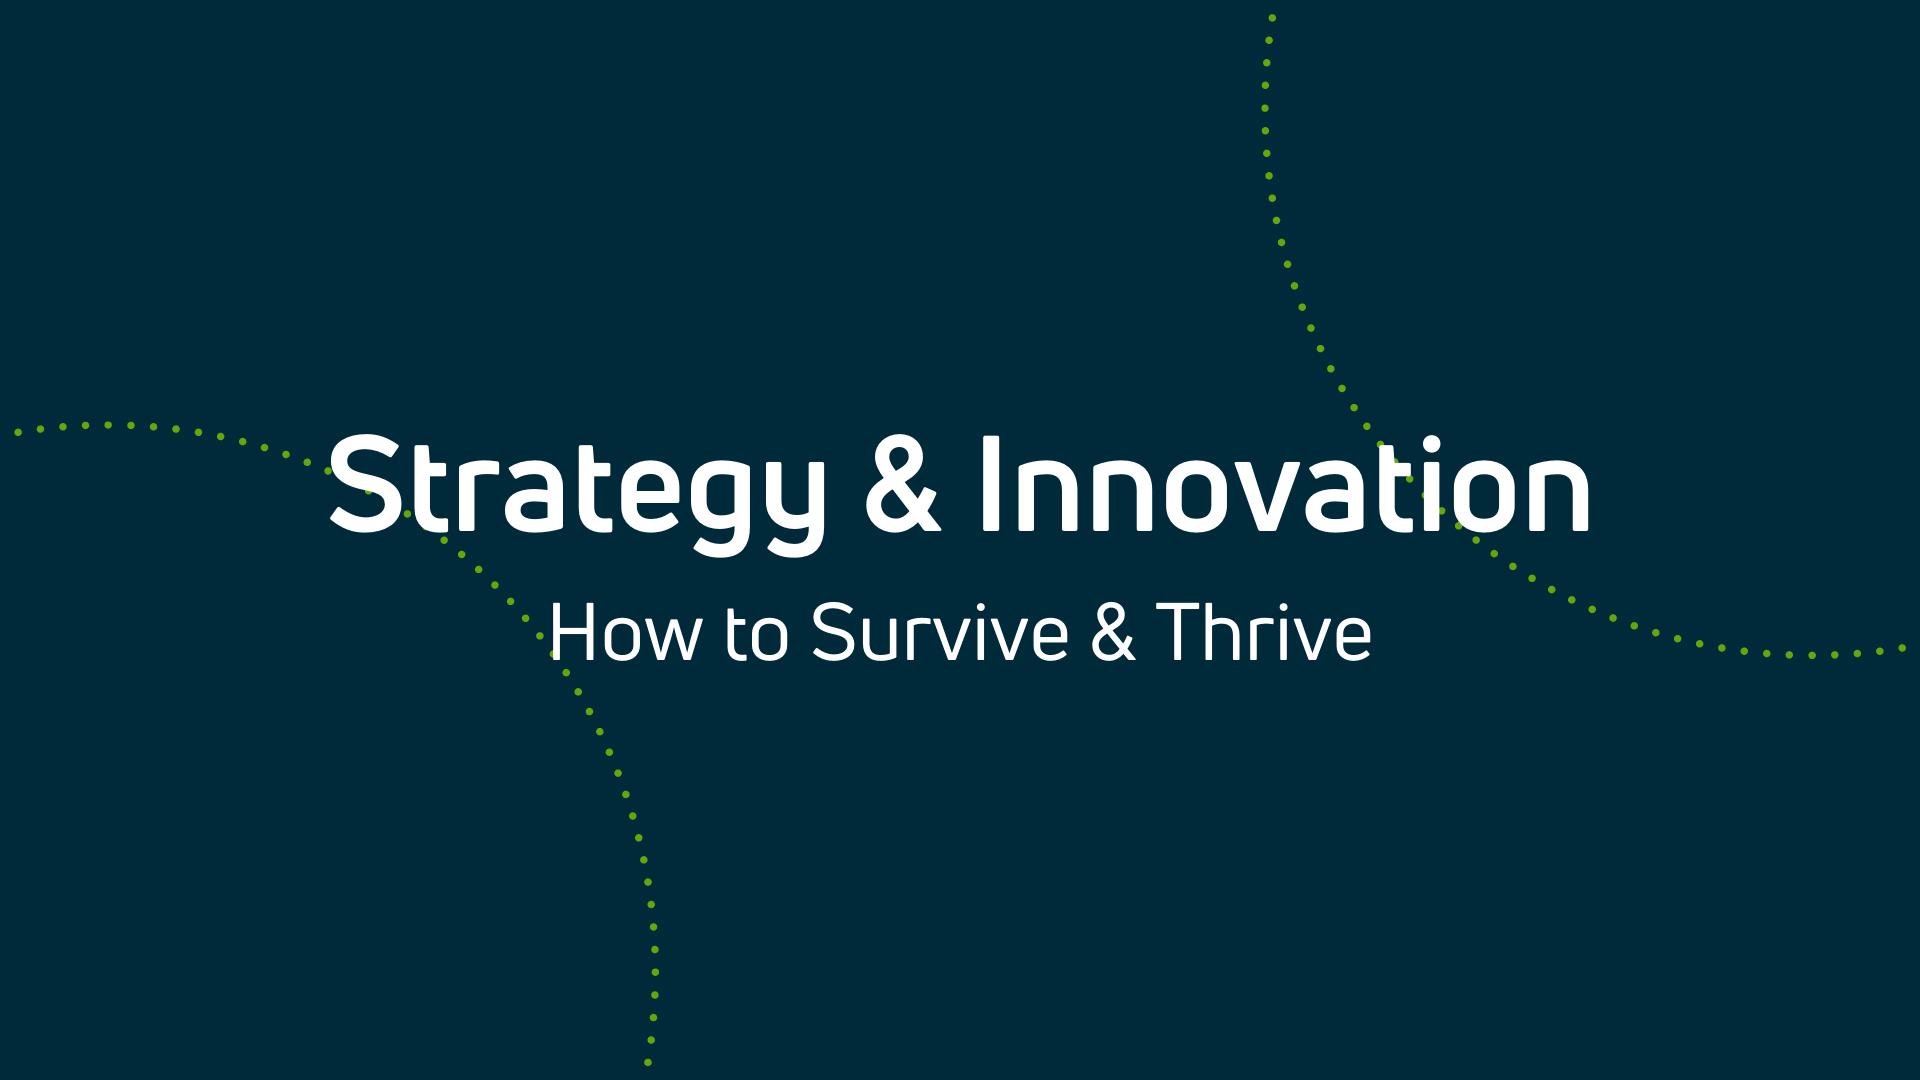 strategyinnovation.png